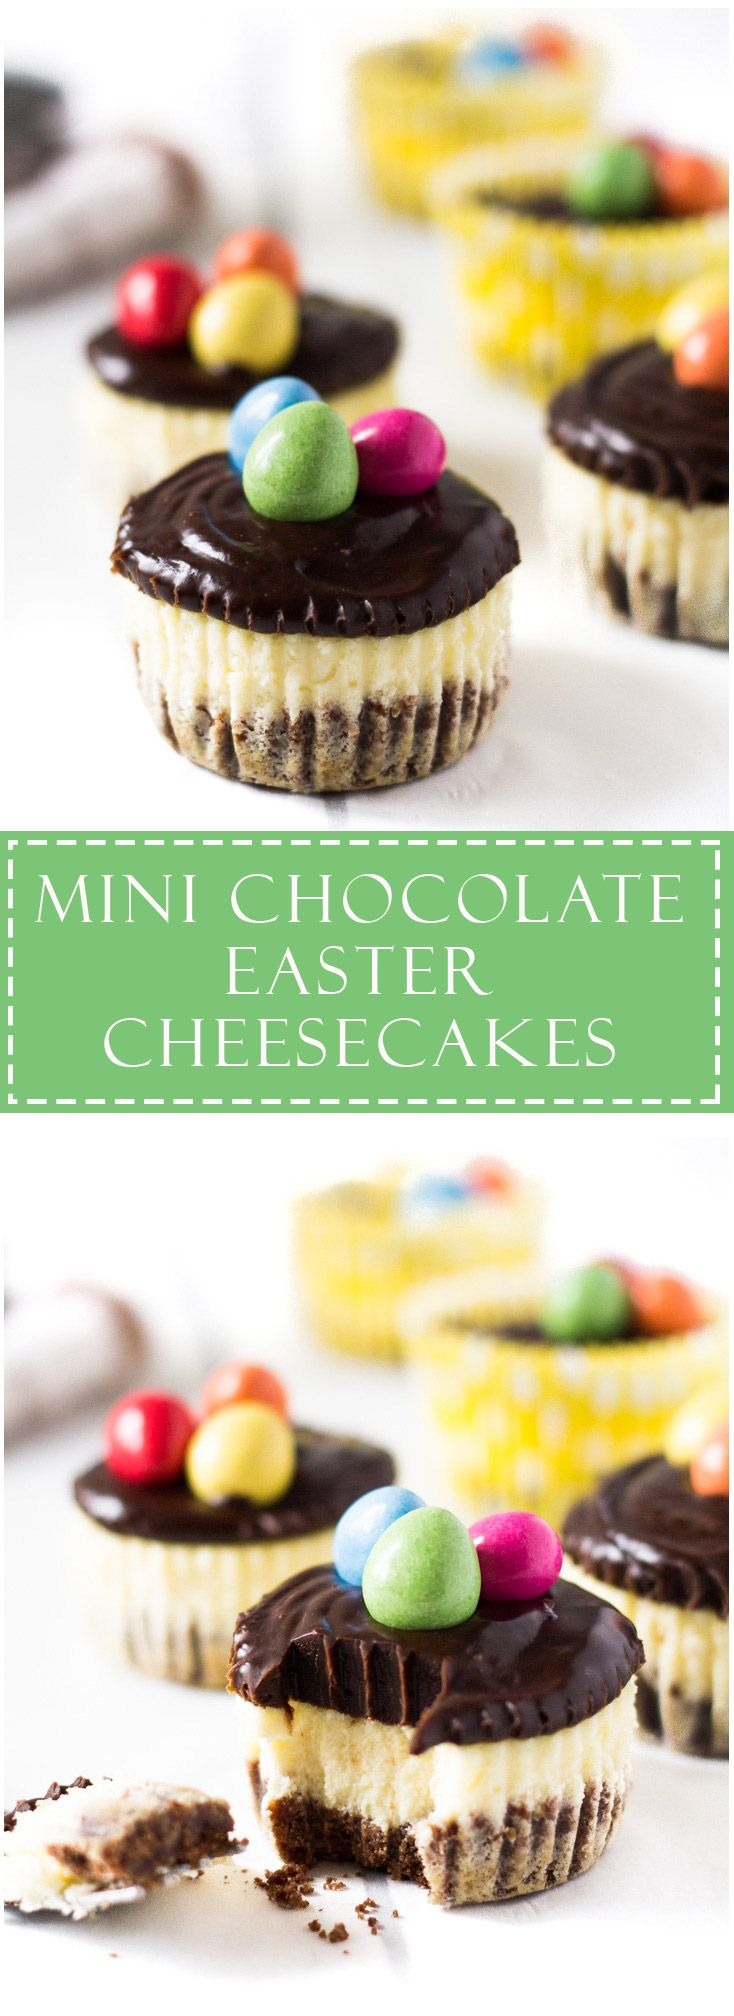 Mini Chocolate Easter Cheesecakes | Marsha's Baking Addiction